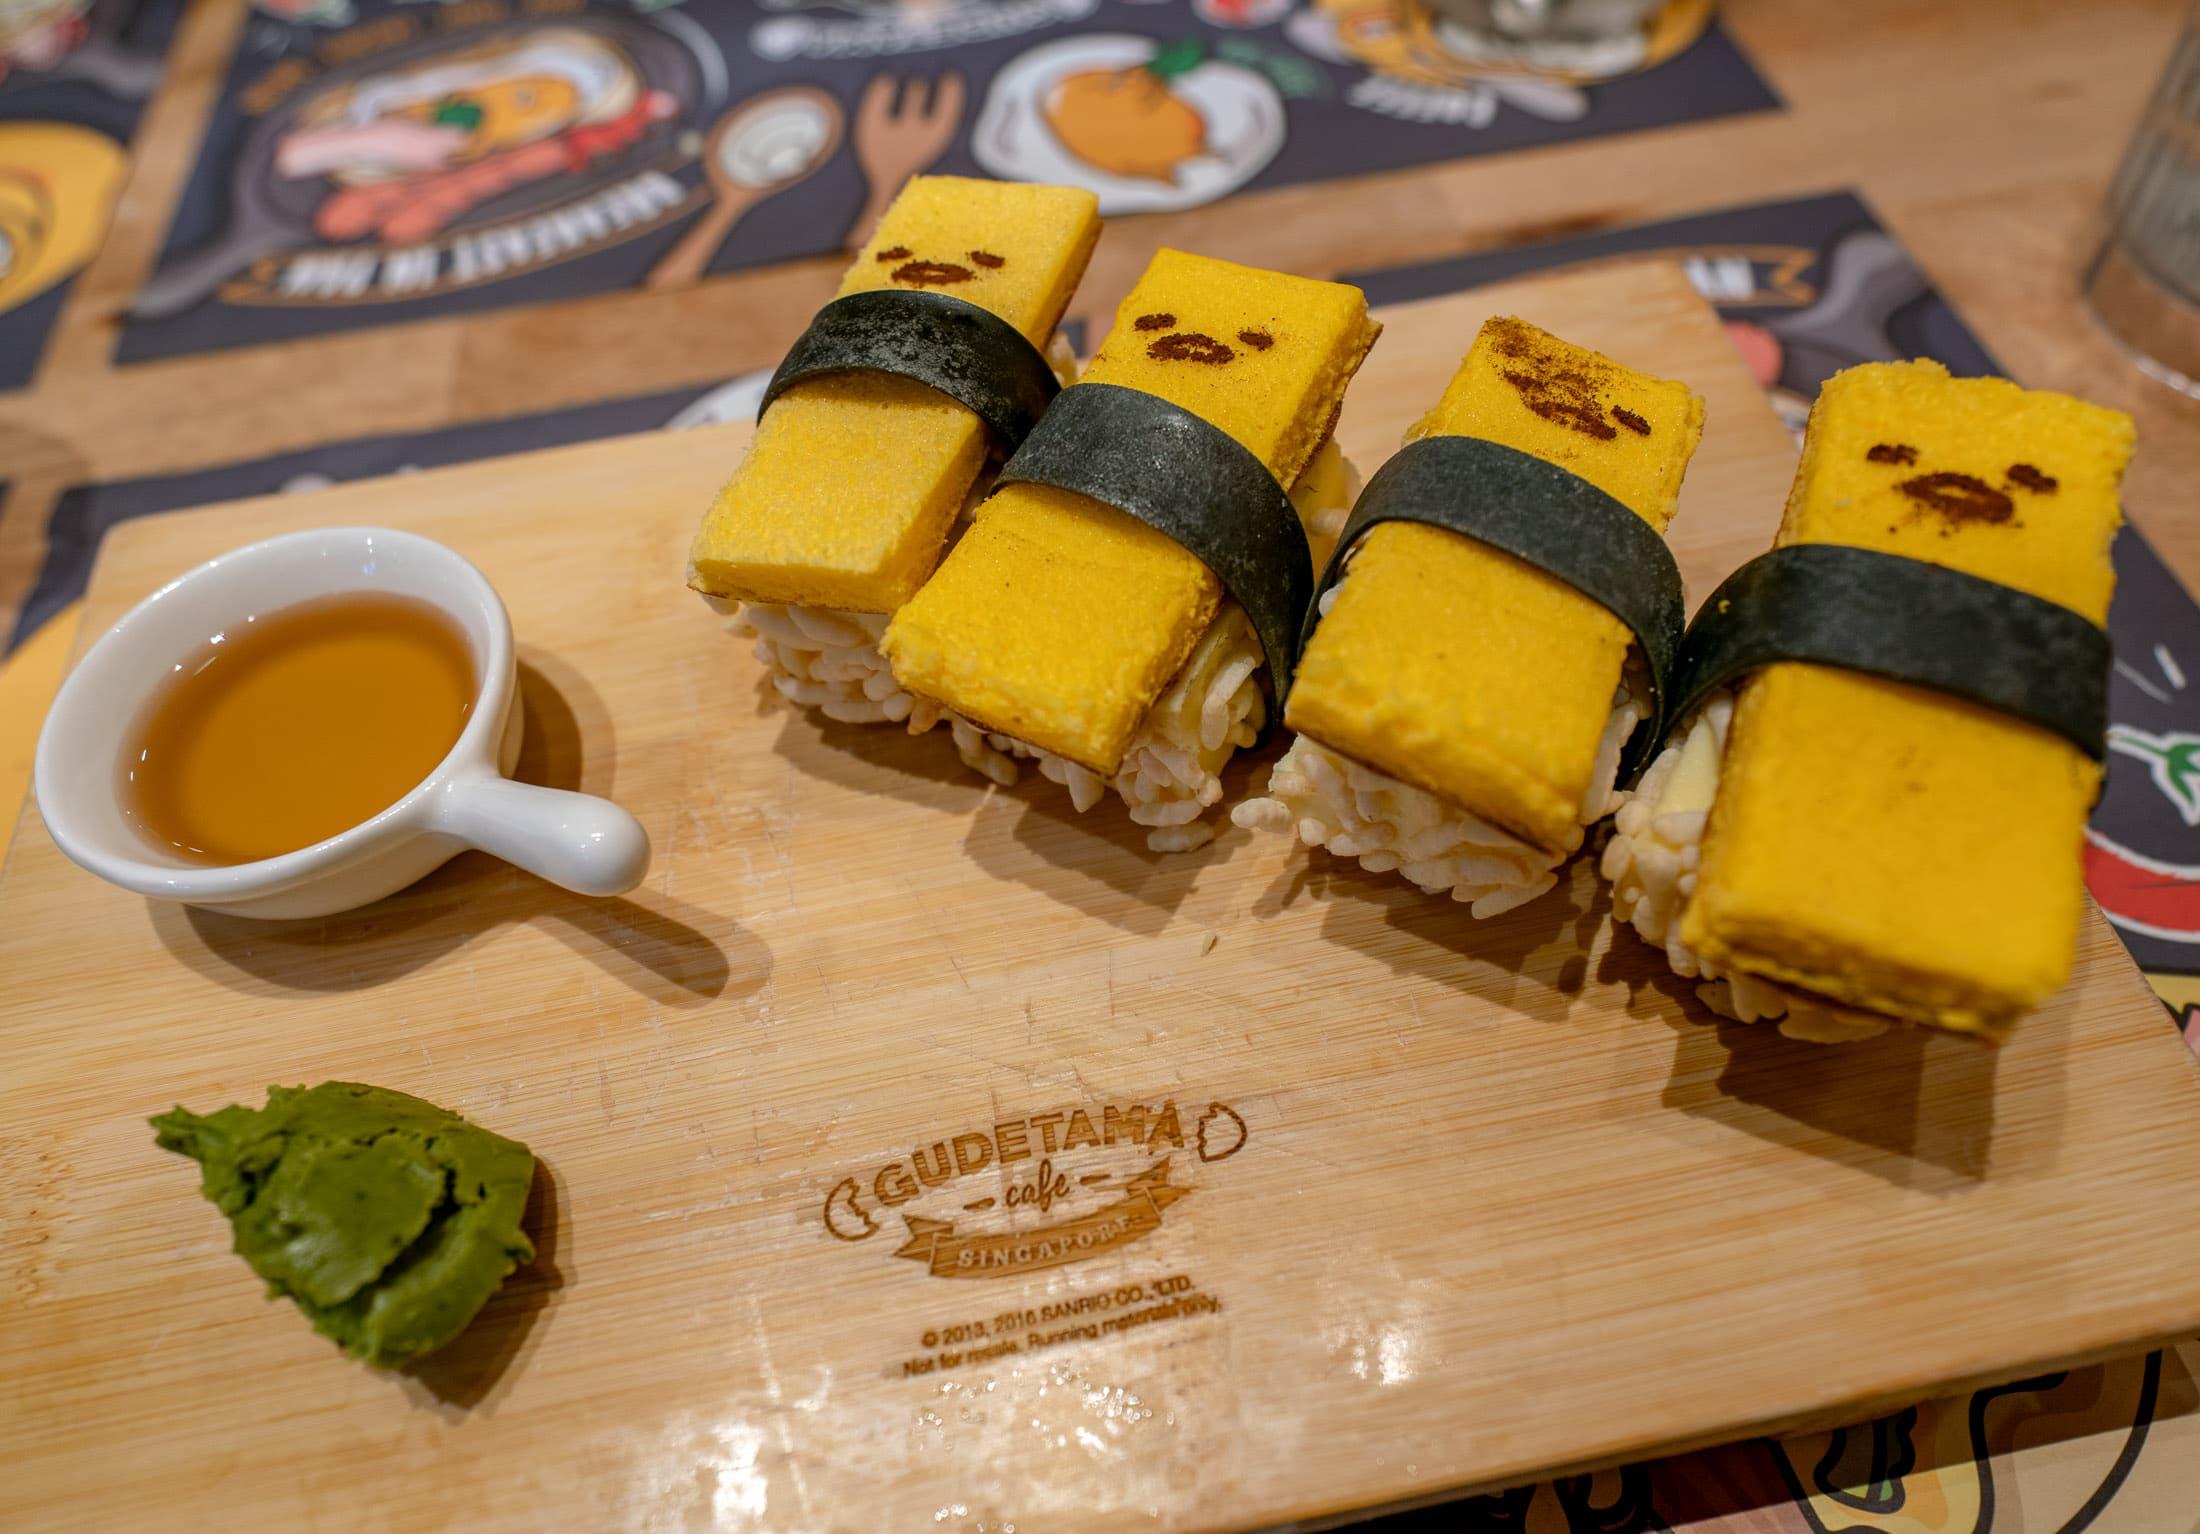 Ta-Ma-Go Gudetama Cafe Singapore